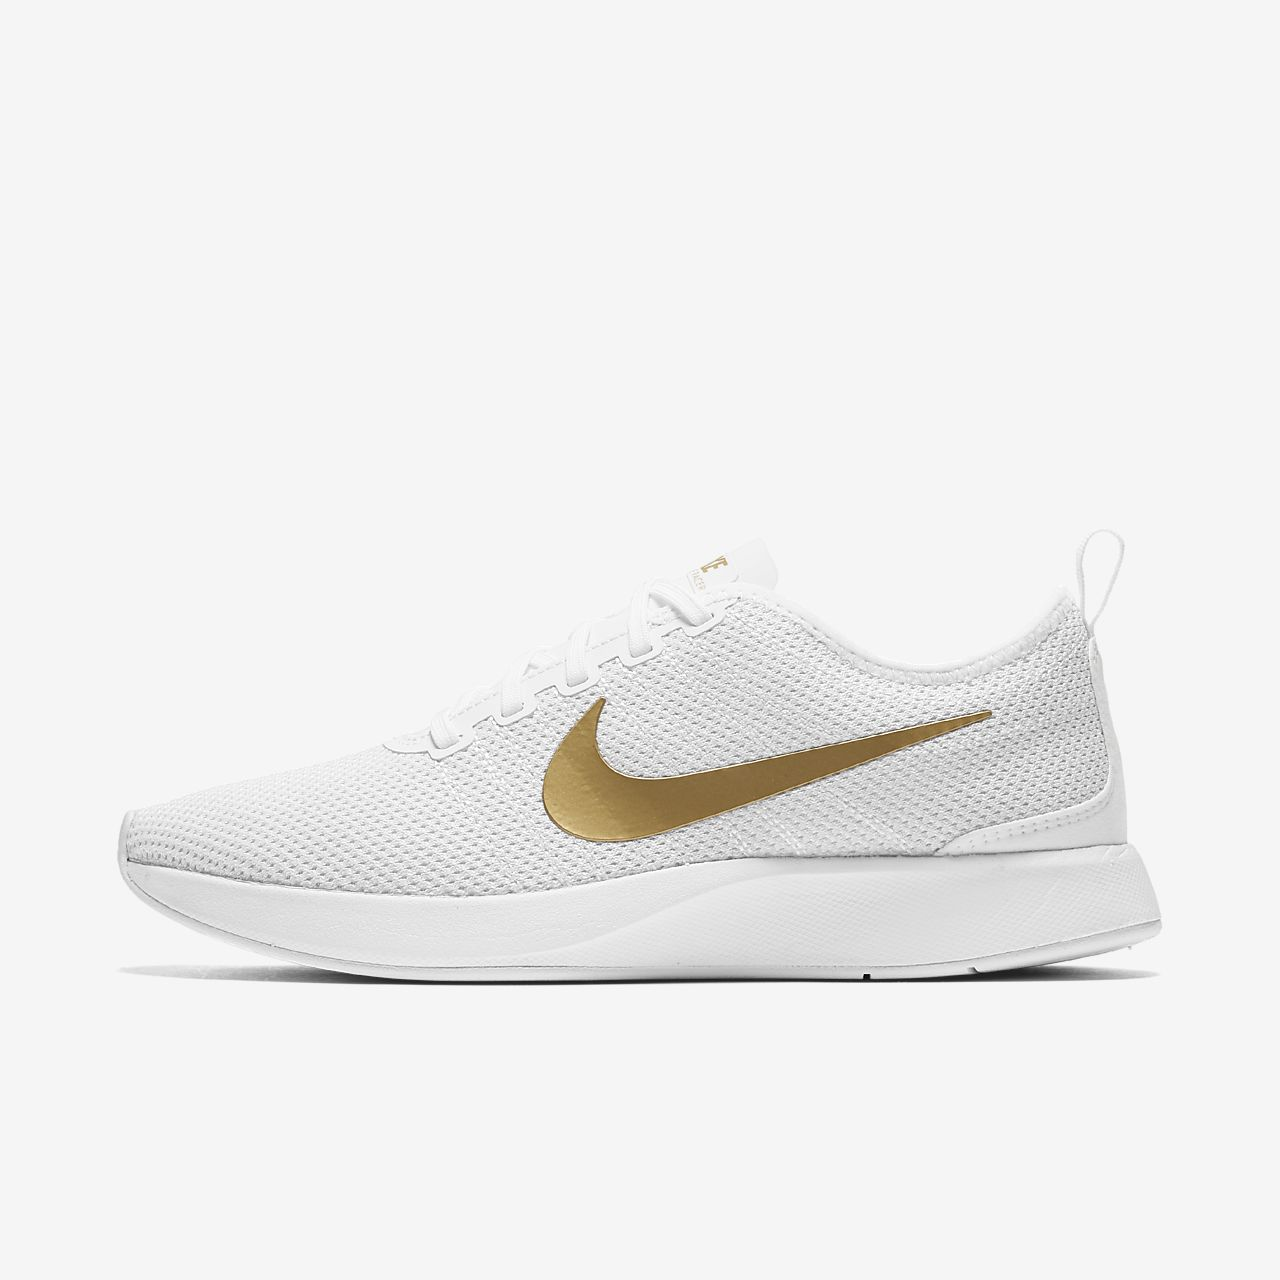 ... Nike Dualtone Racer SE Women's Shoe